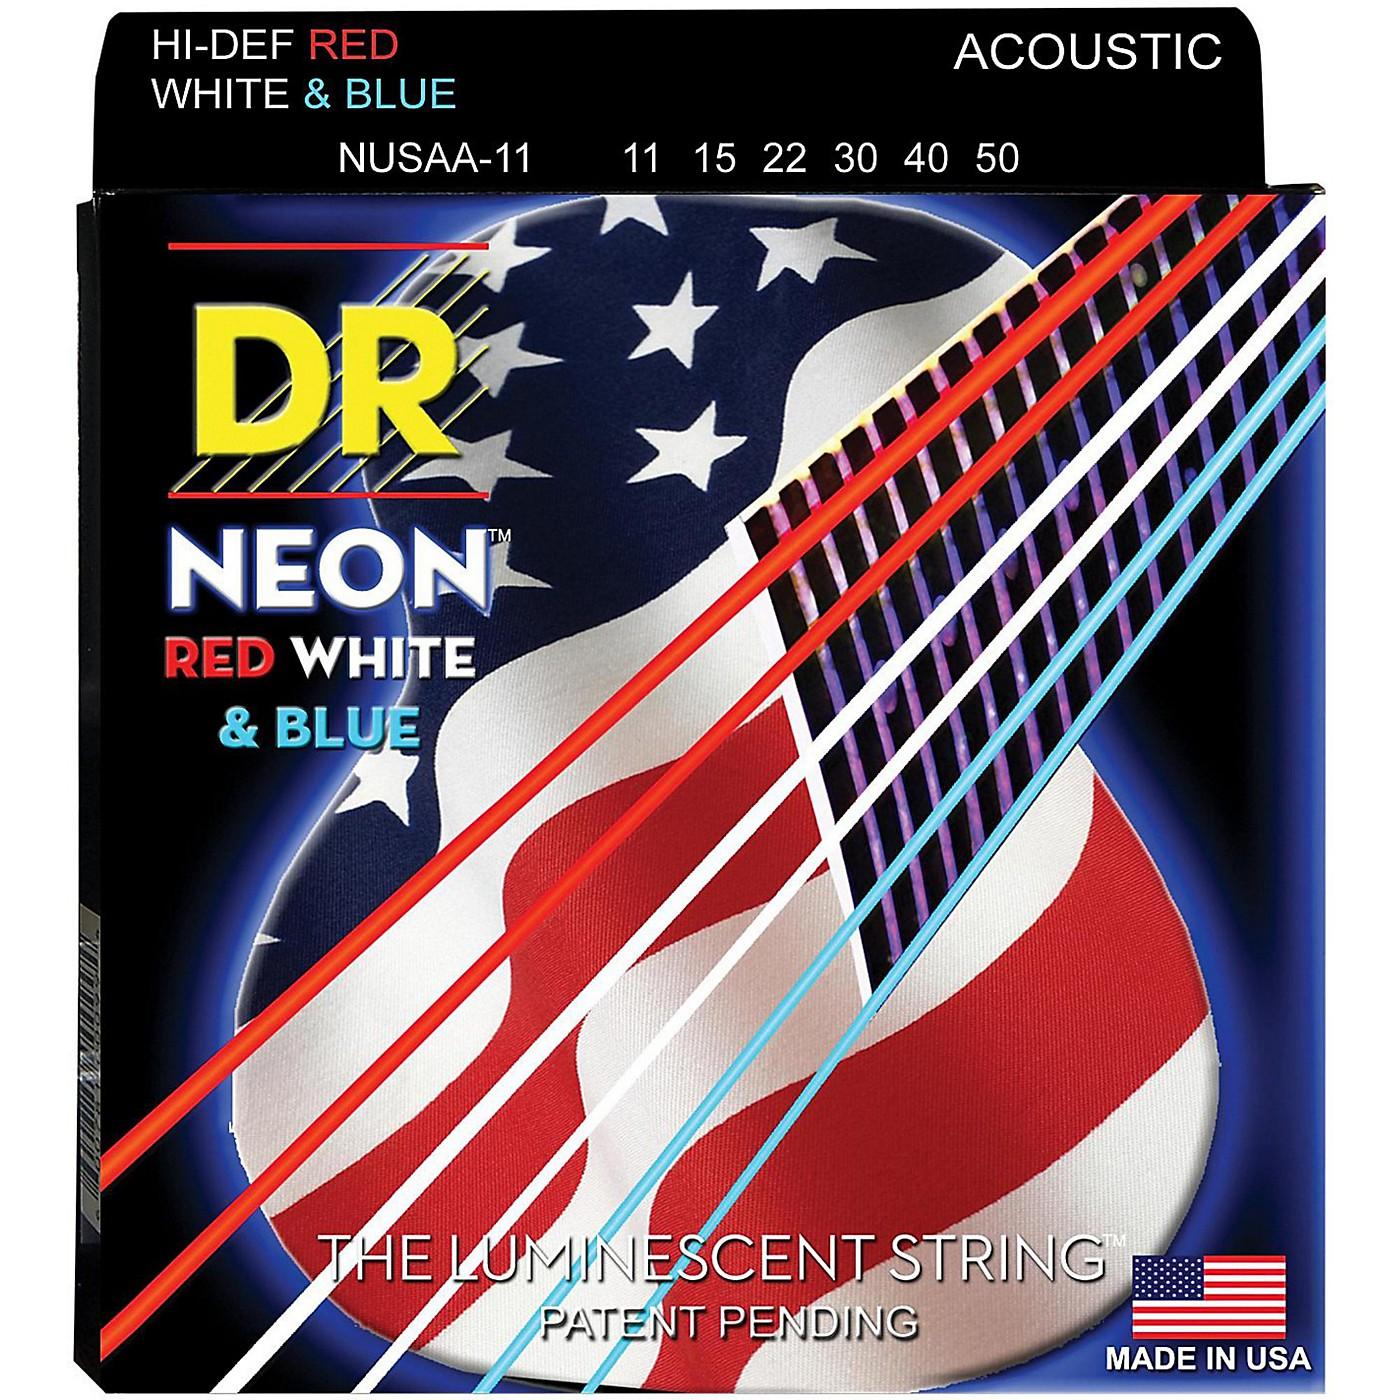 DR Strings Hi-Def NEON Red, White & Blue Acoustic Guitar Medium-Lite Strings thumbnail